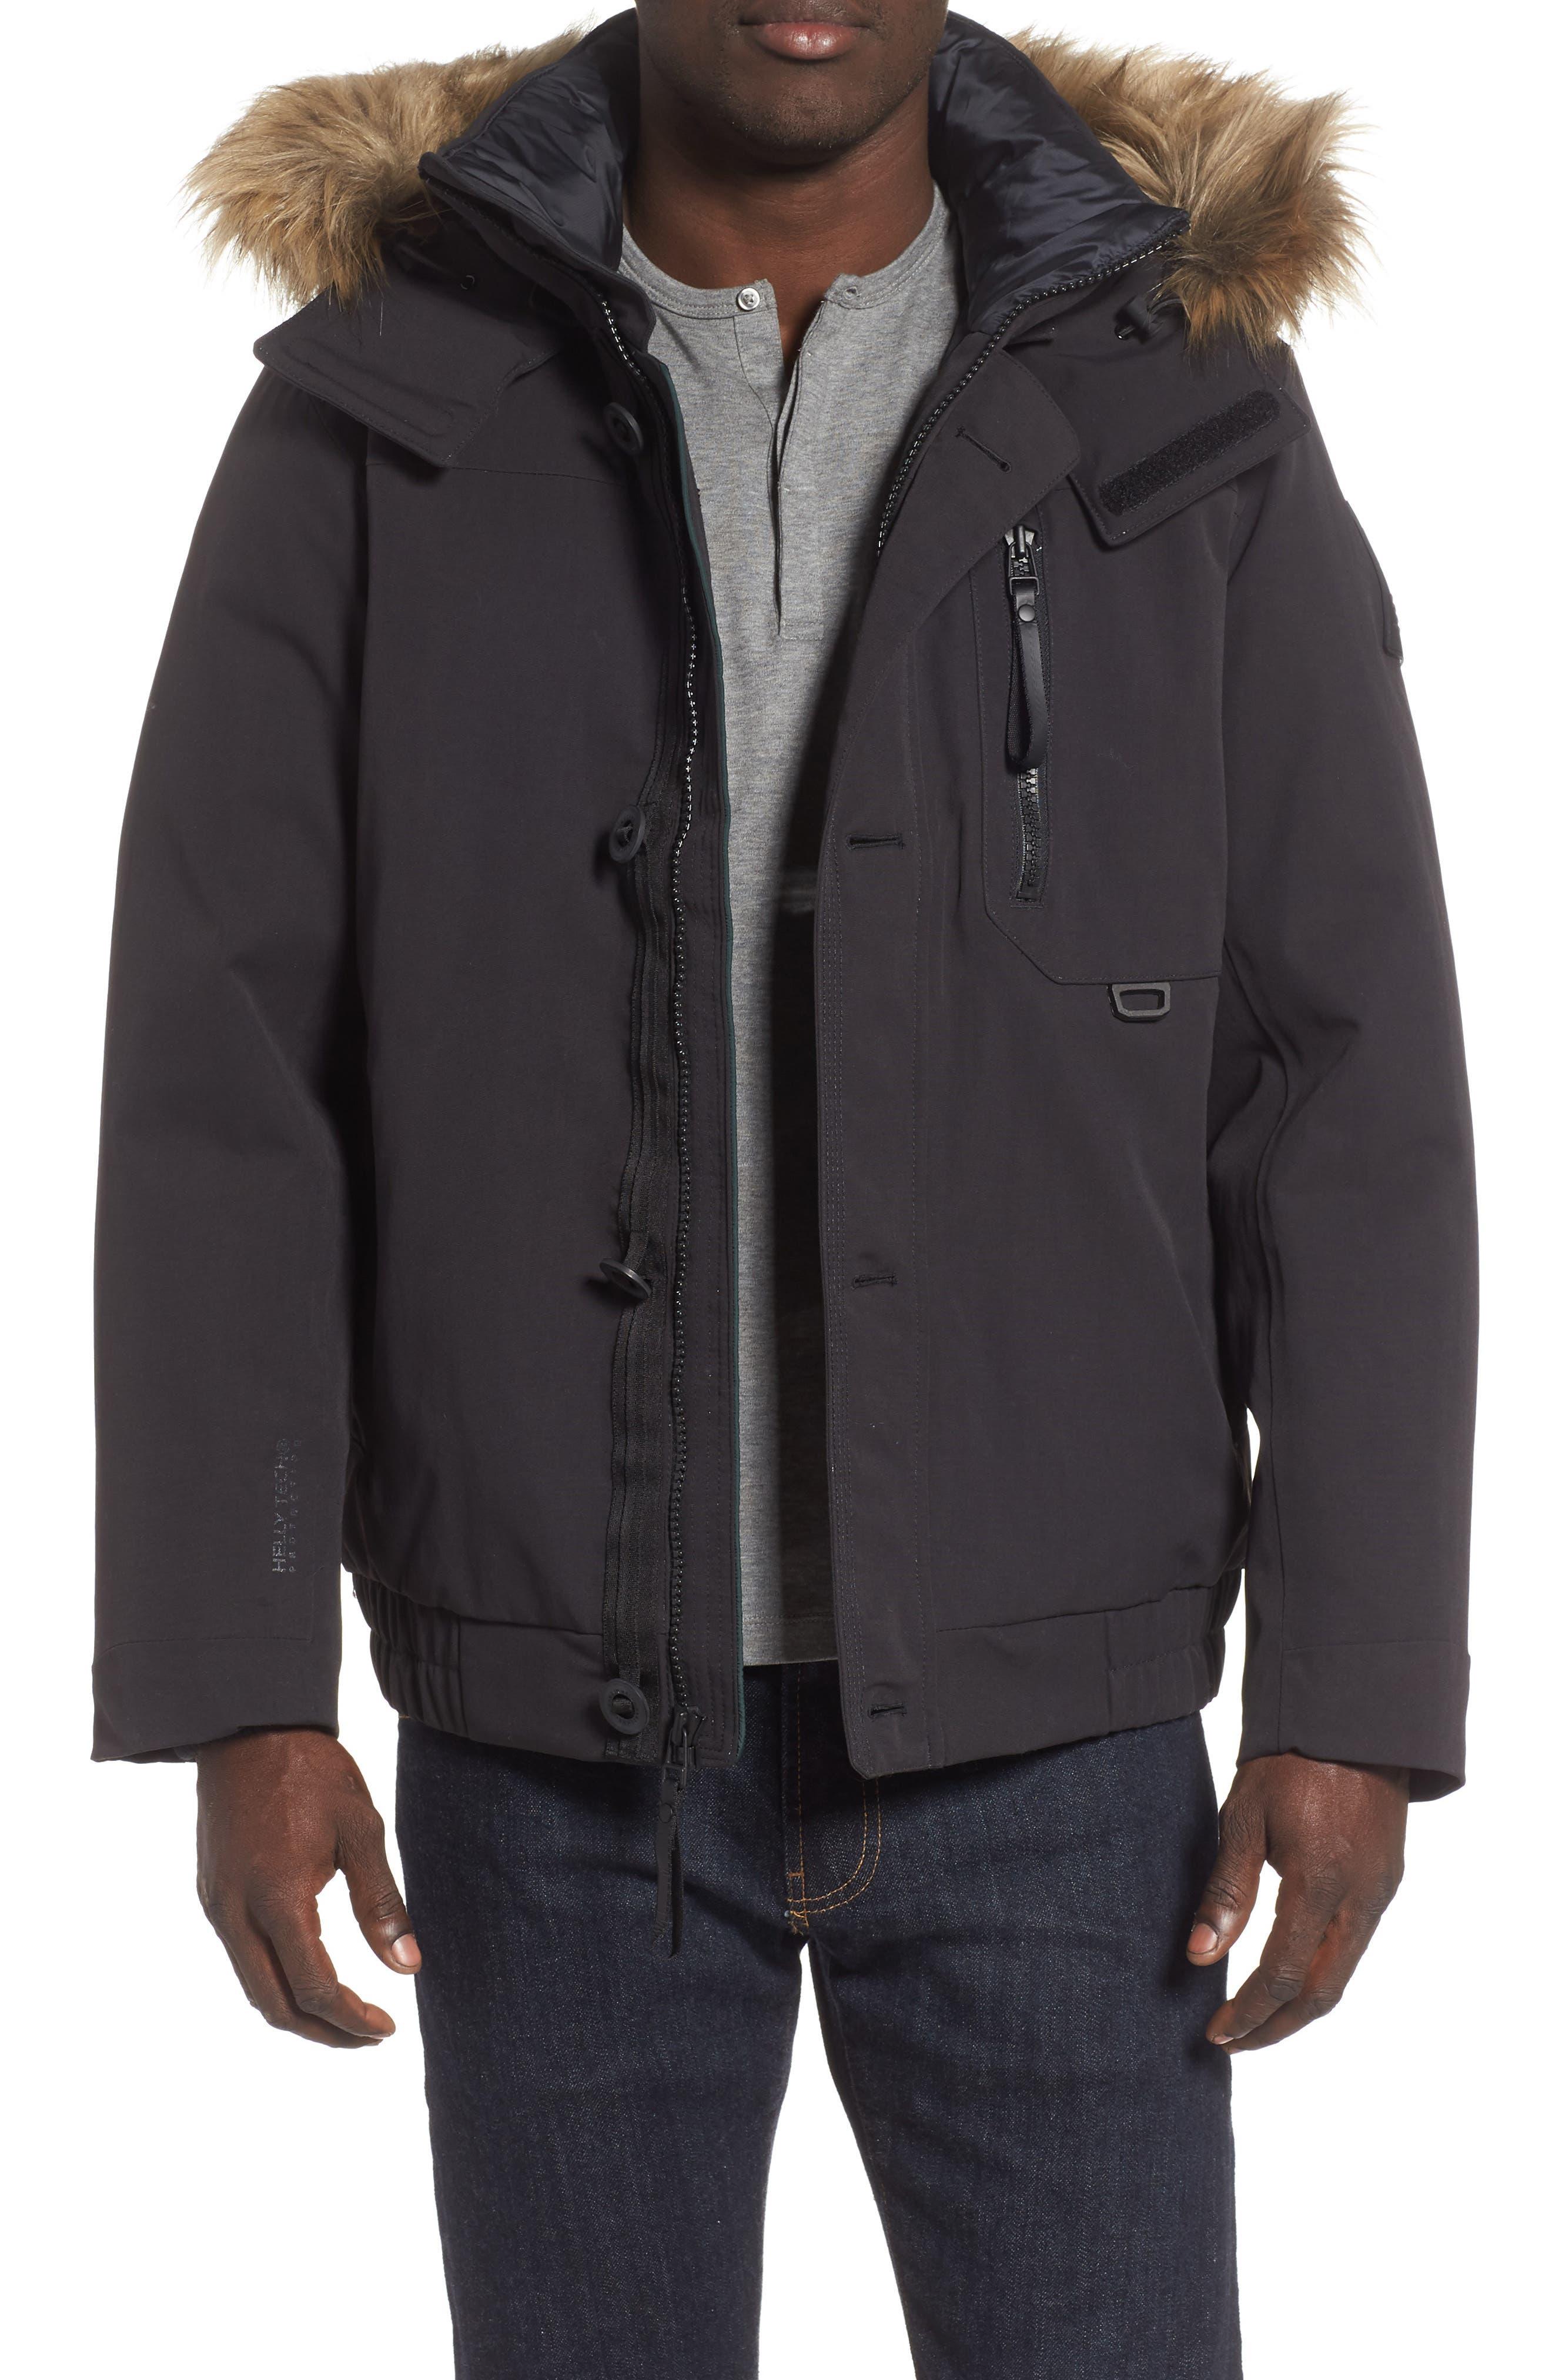 Bardu Waterproof Bomber Jacket with Detachable Hood and Faux Fur Trim,                         Main,                         color, BLACK